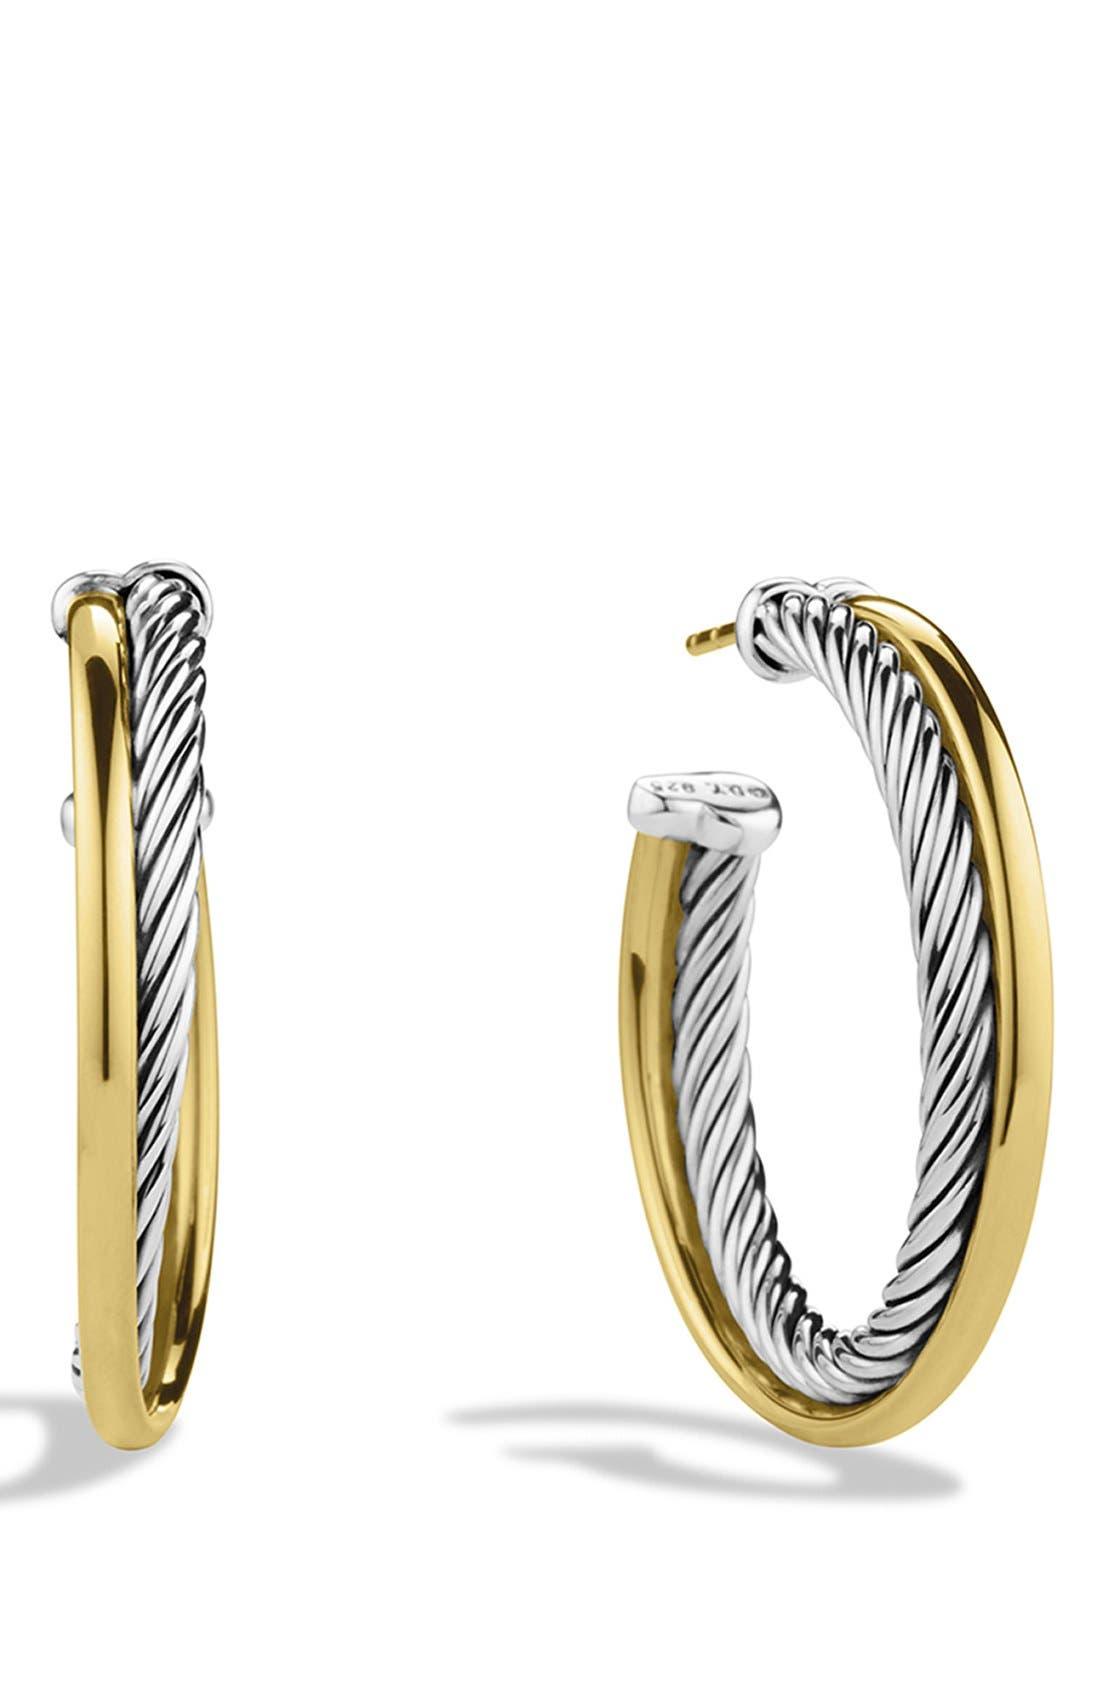 Main Image - David Yurman 'Crossover' Medium Hoop Earrings with Gold